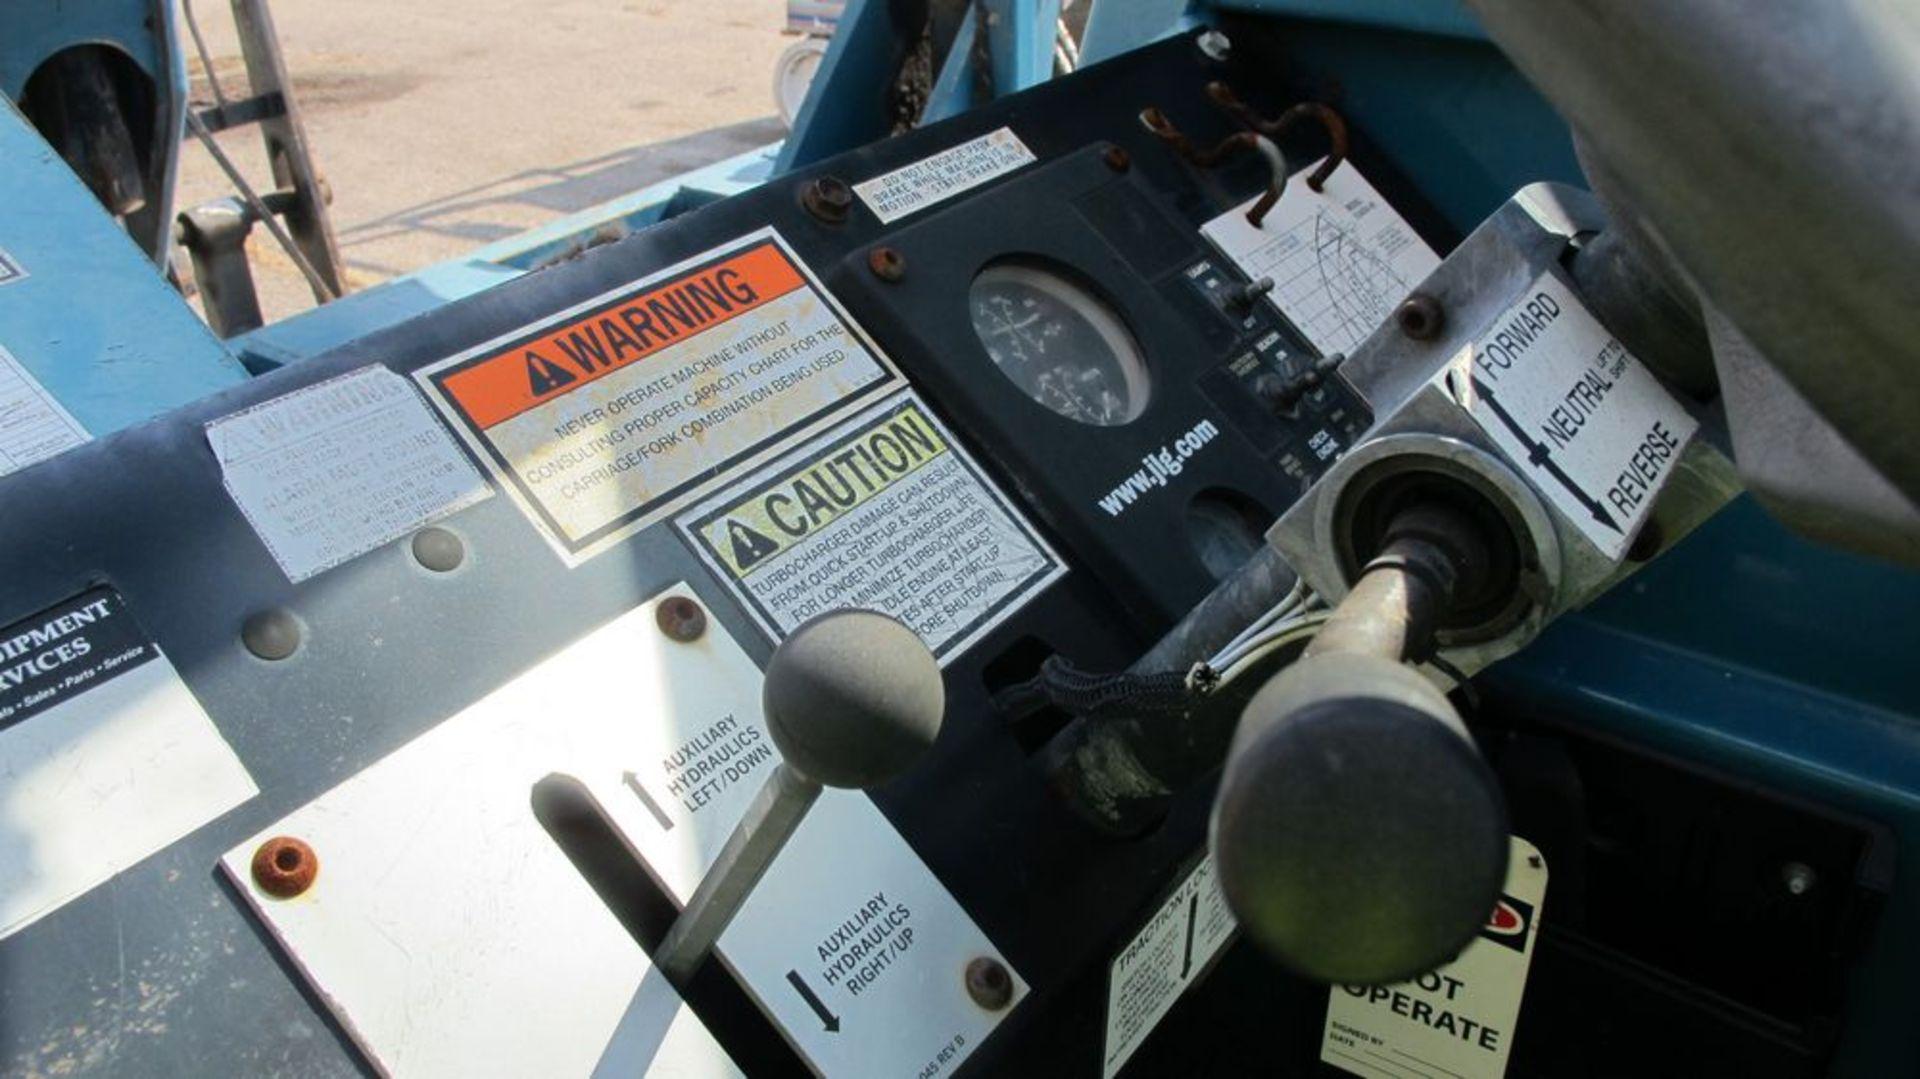 Lot 6 - JLG TELESCOPING BOOM MATERIAL HANDLER 53406/9/10/540 (NEEDS REPAIR) (WAREHOUSE 30 - PARKING LOT)